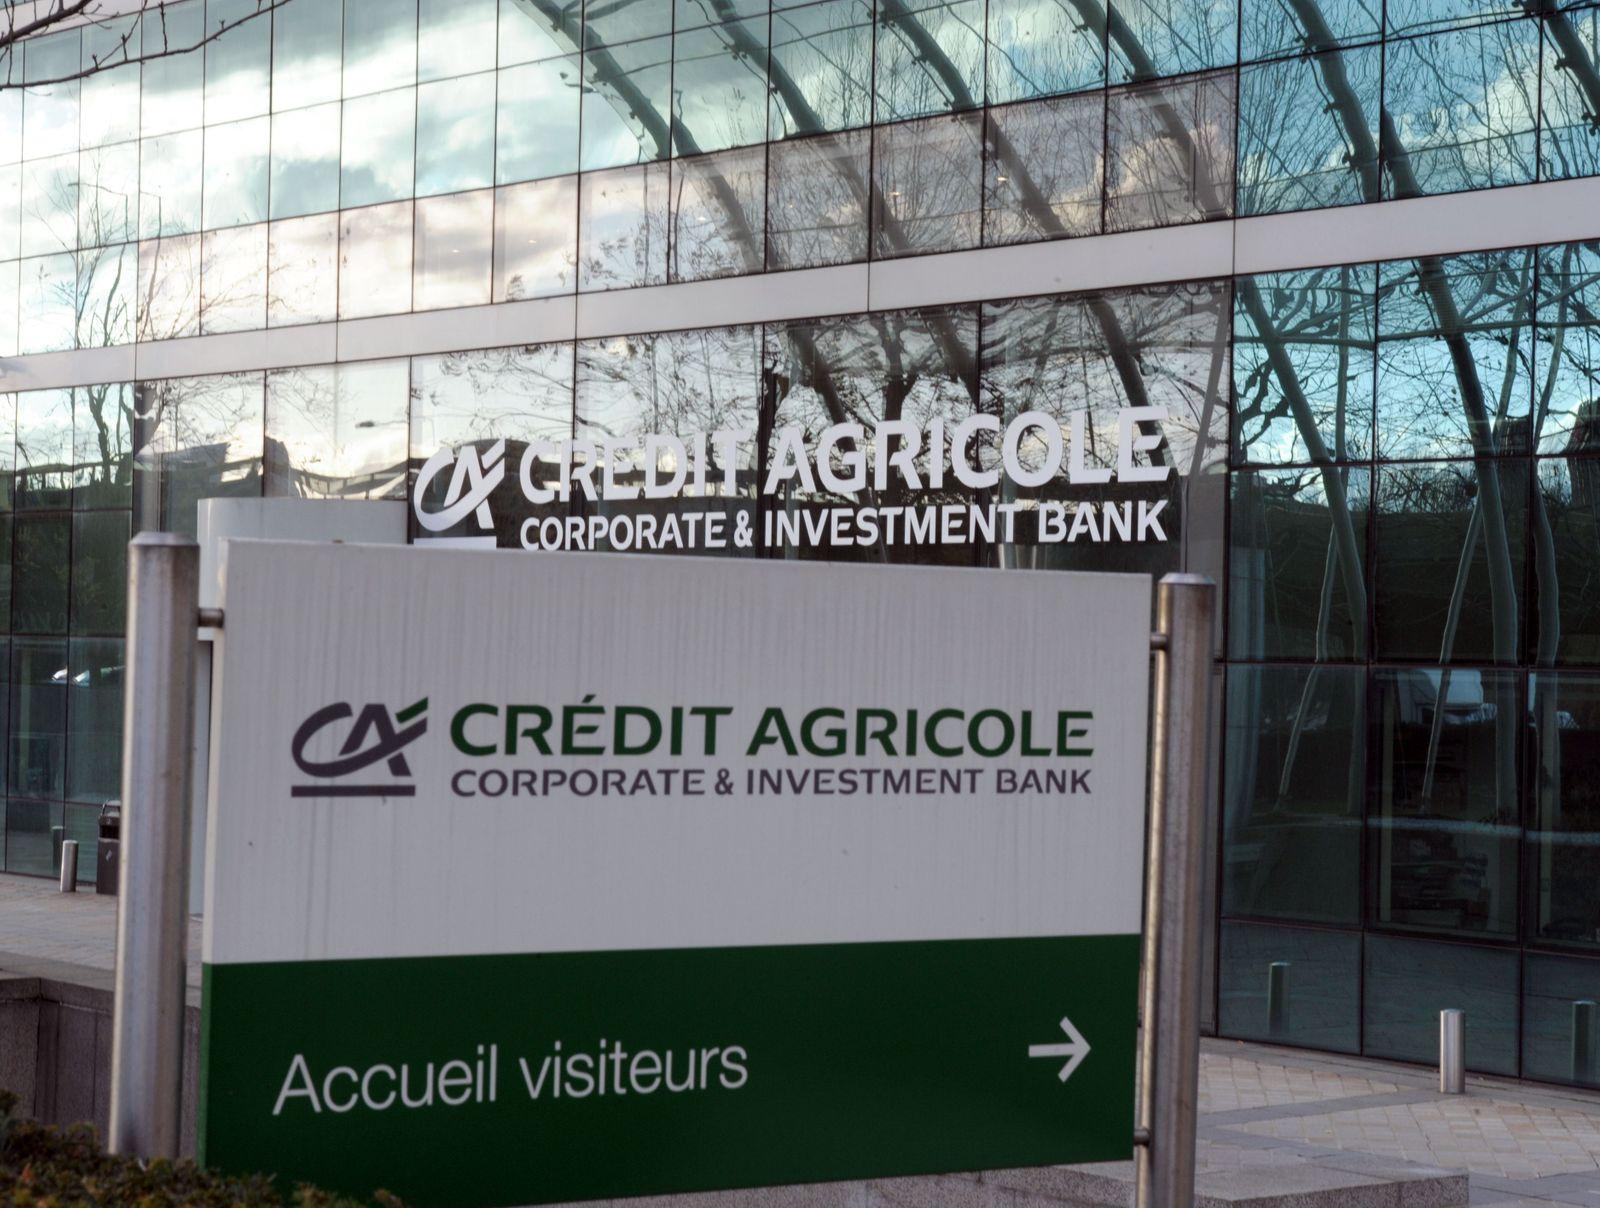 Credit Agricole / logo